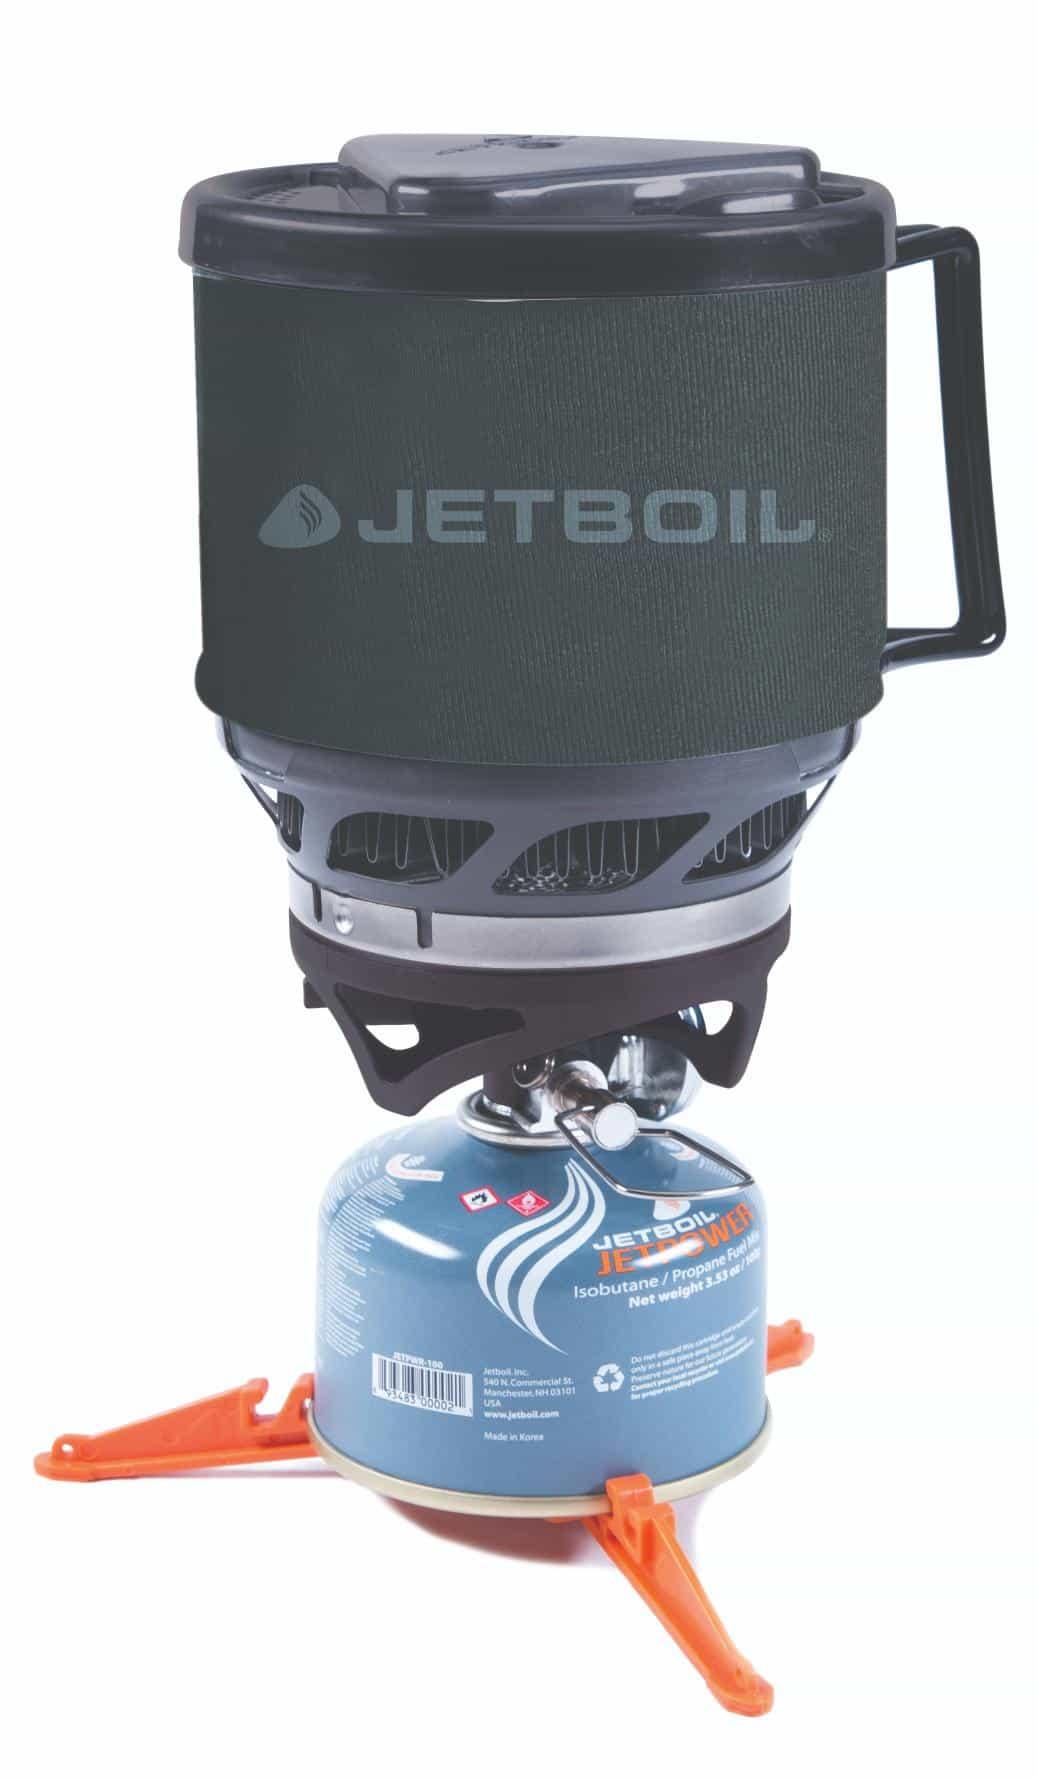 Jetboil-MiniMo